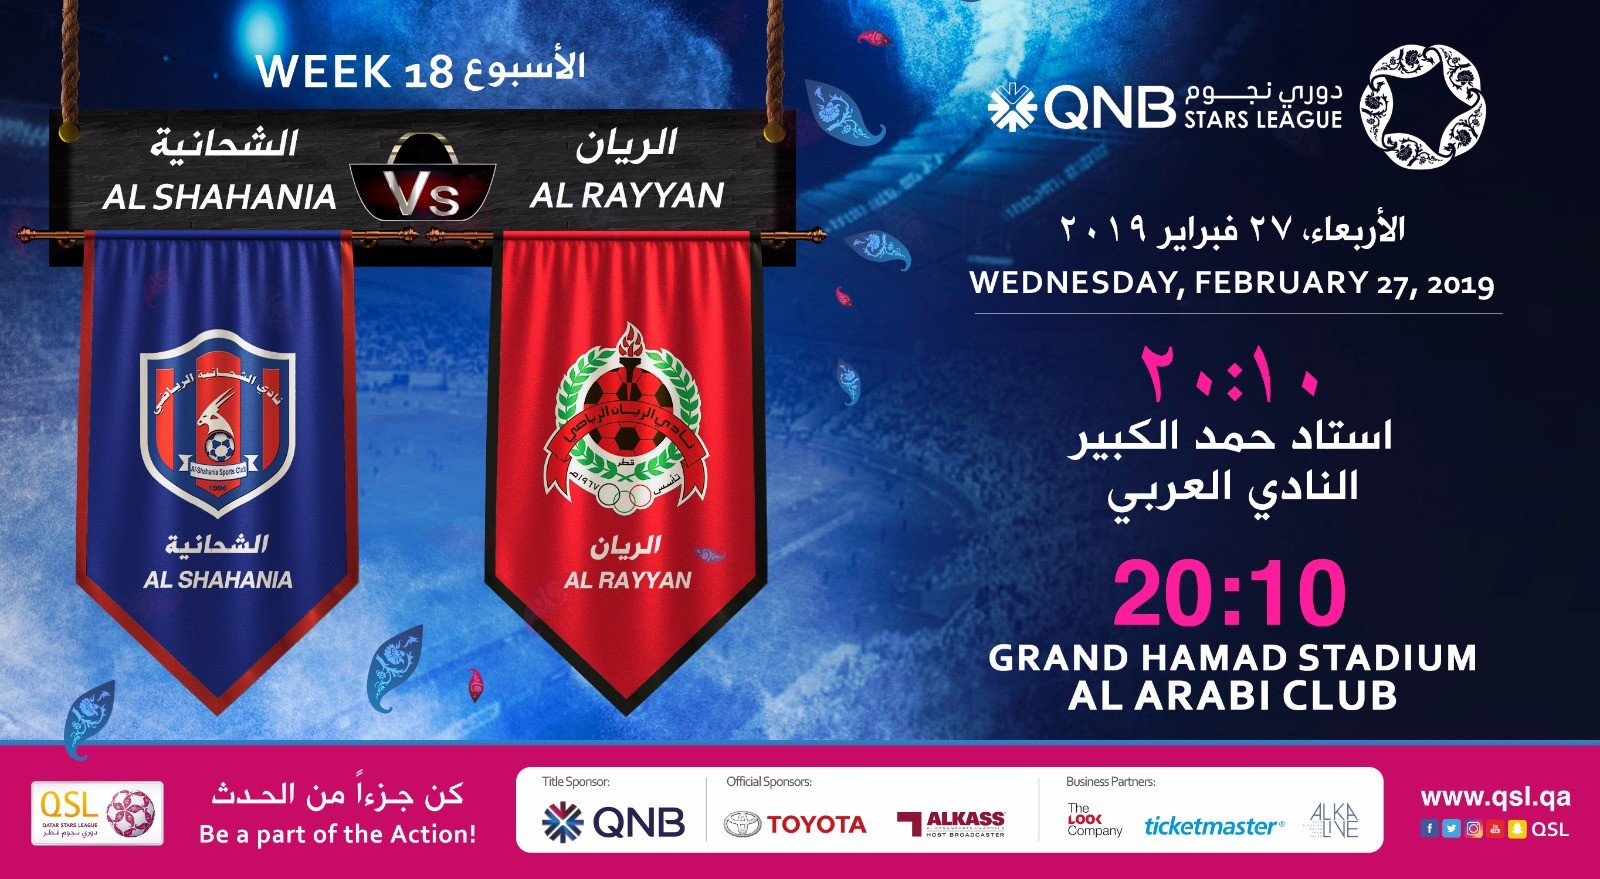 QNB Stars League Week 18 — Al Shahania vs Al Rayyan